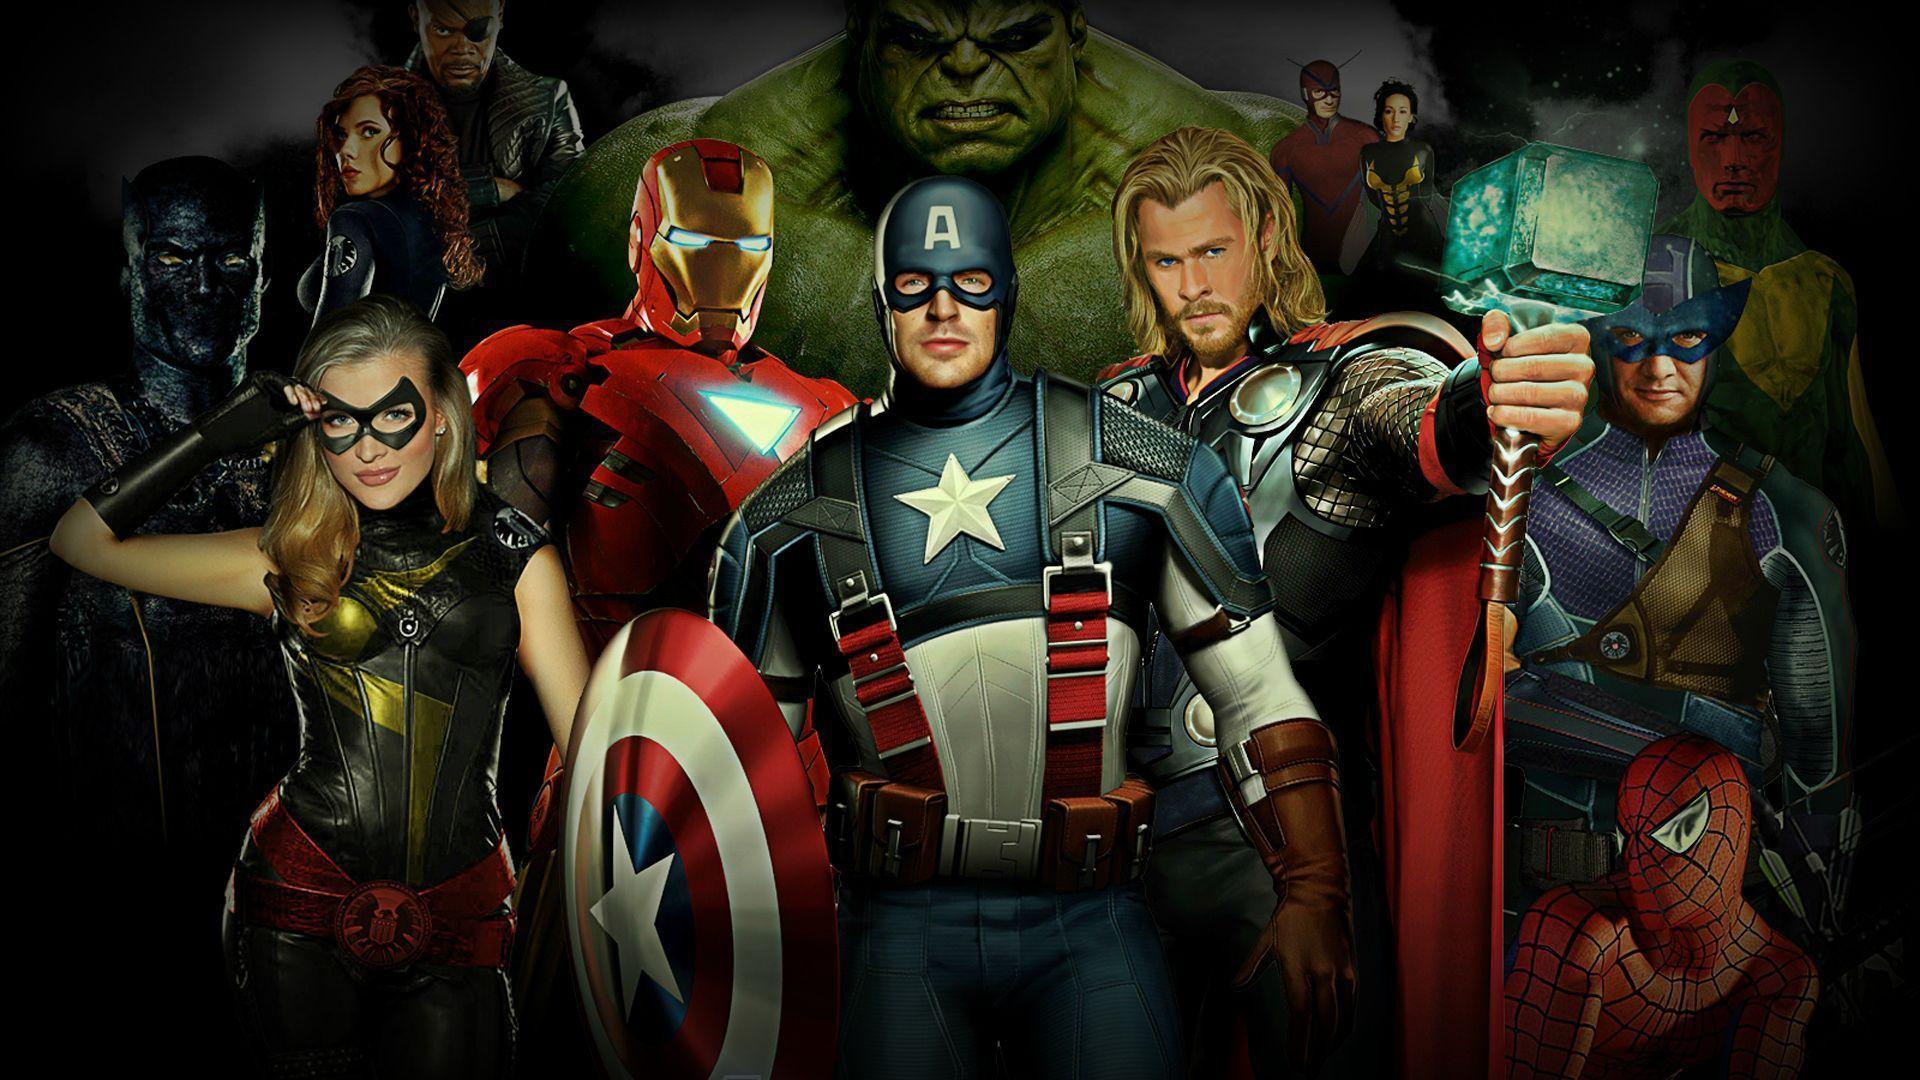 Marvel Super Heroes Wallpapers Hd Wallpaper Cave